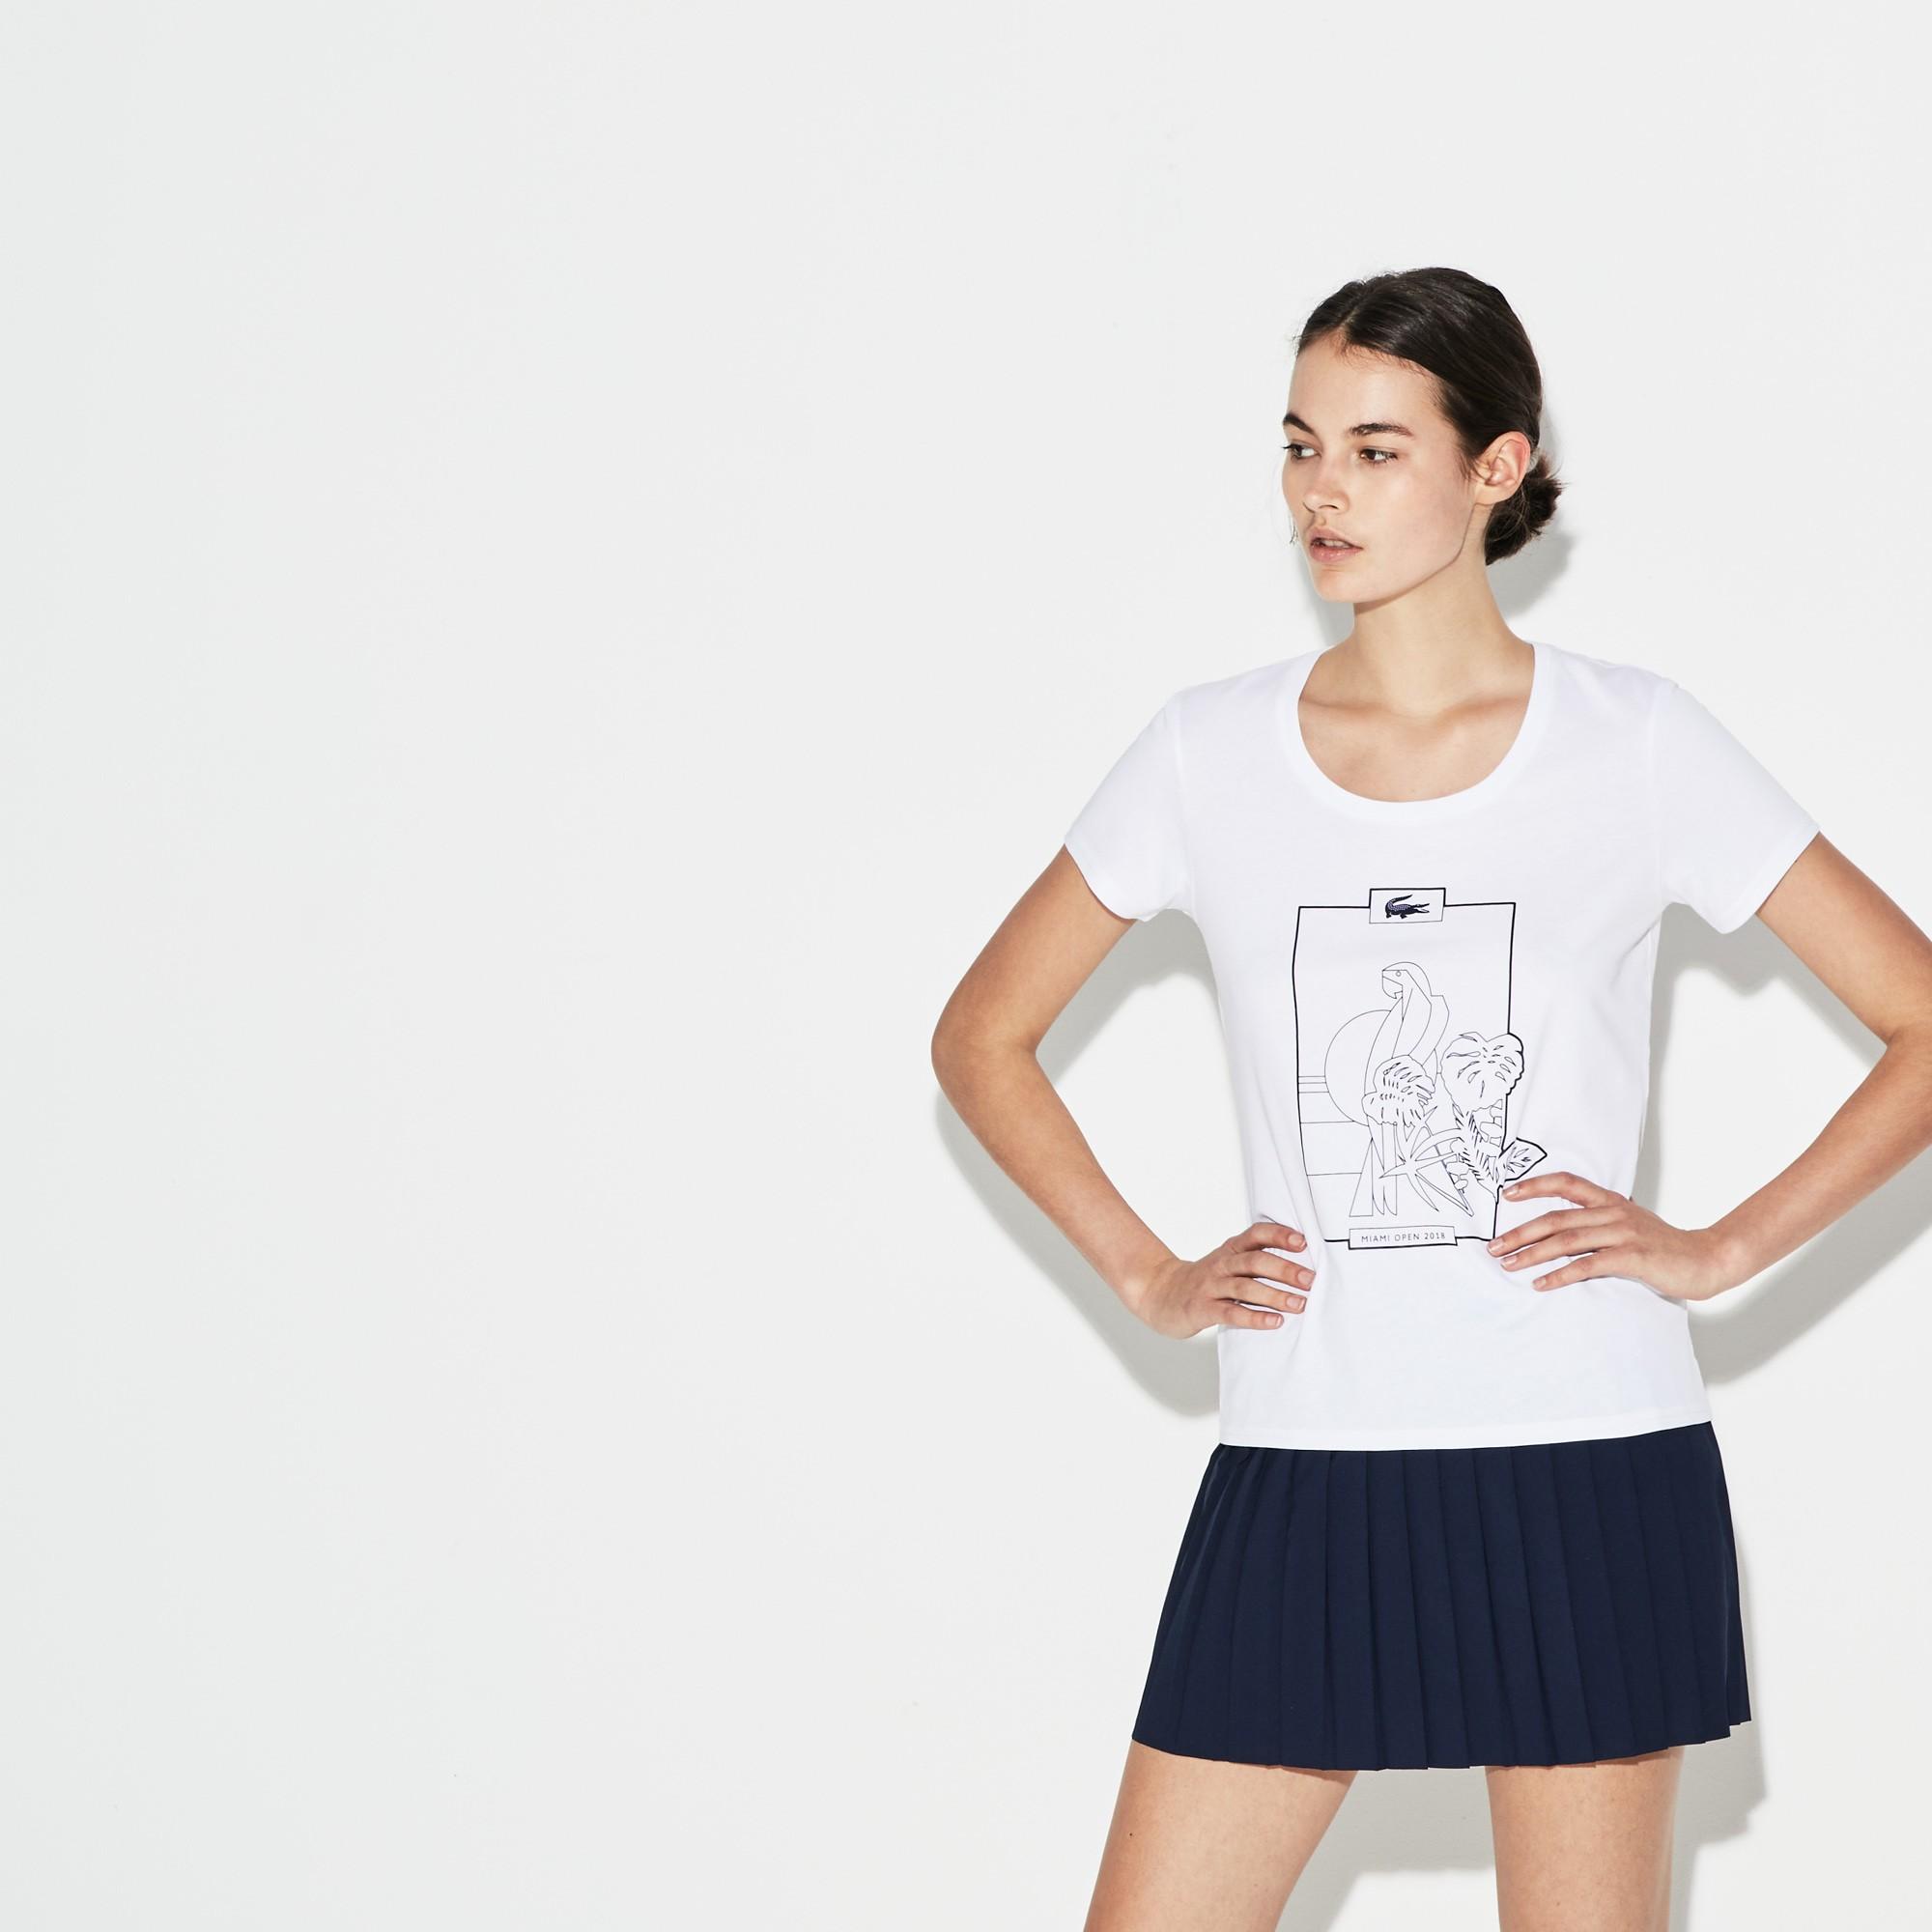 bac6eae6d Lacoste Women's Sport Miami Open Design Jersey Tennis T-Shirt - Silver/Navy  Blue 10